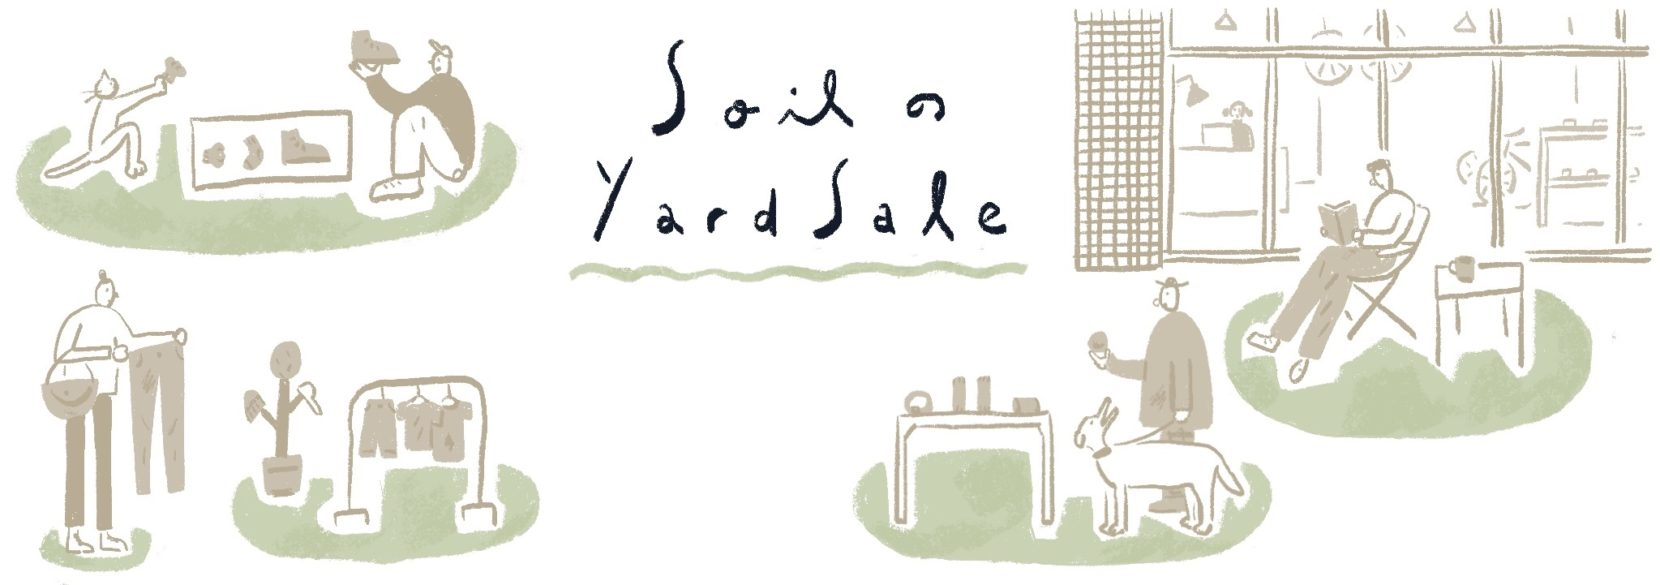 tokyobike谷中soil yardsale